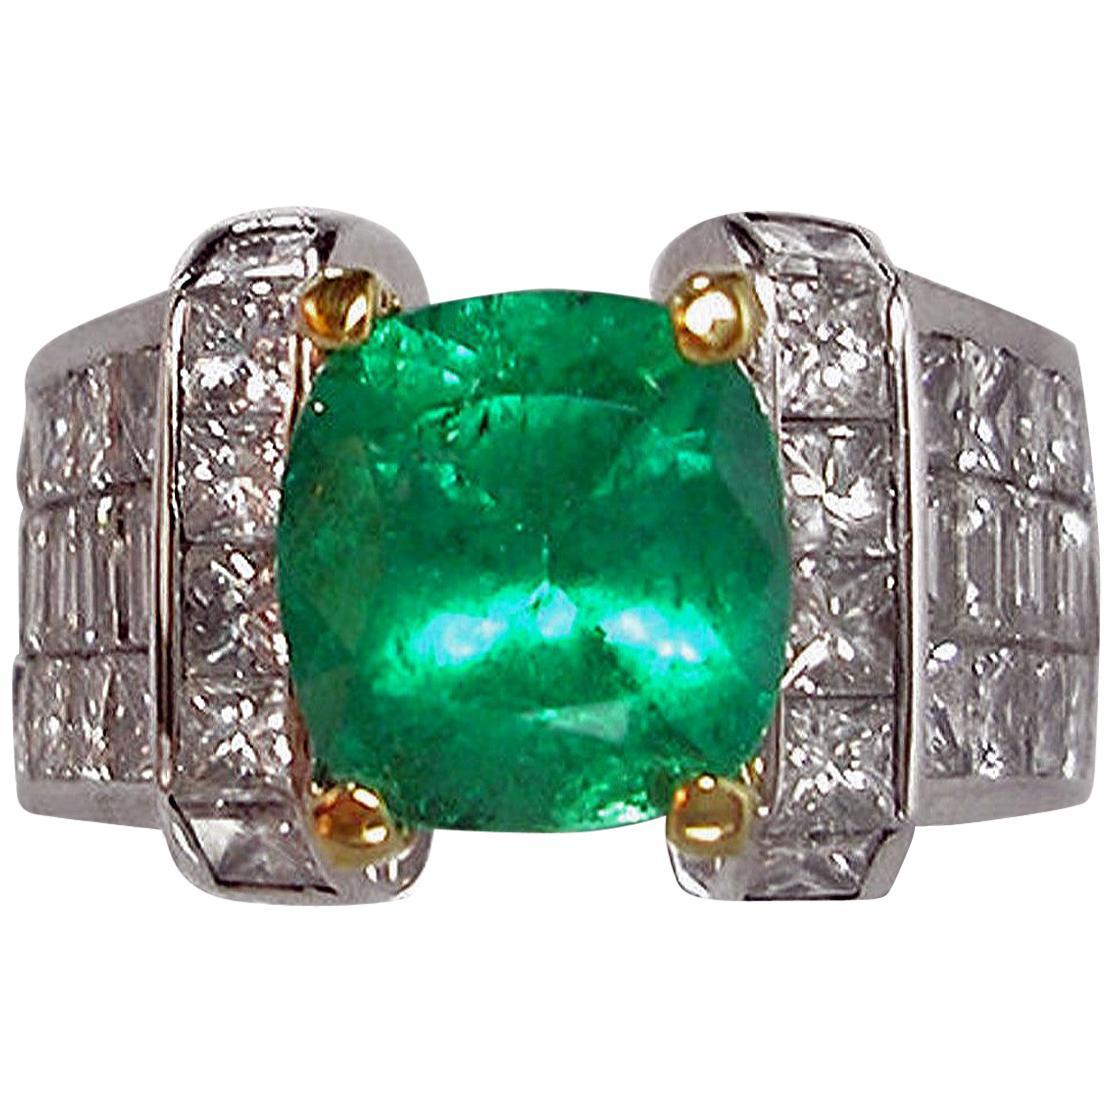 Estate 7.56 Carat Fine Natural Colombian Emerald Diamond Ring 18K Unisex